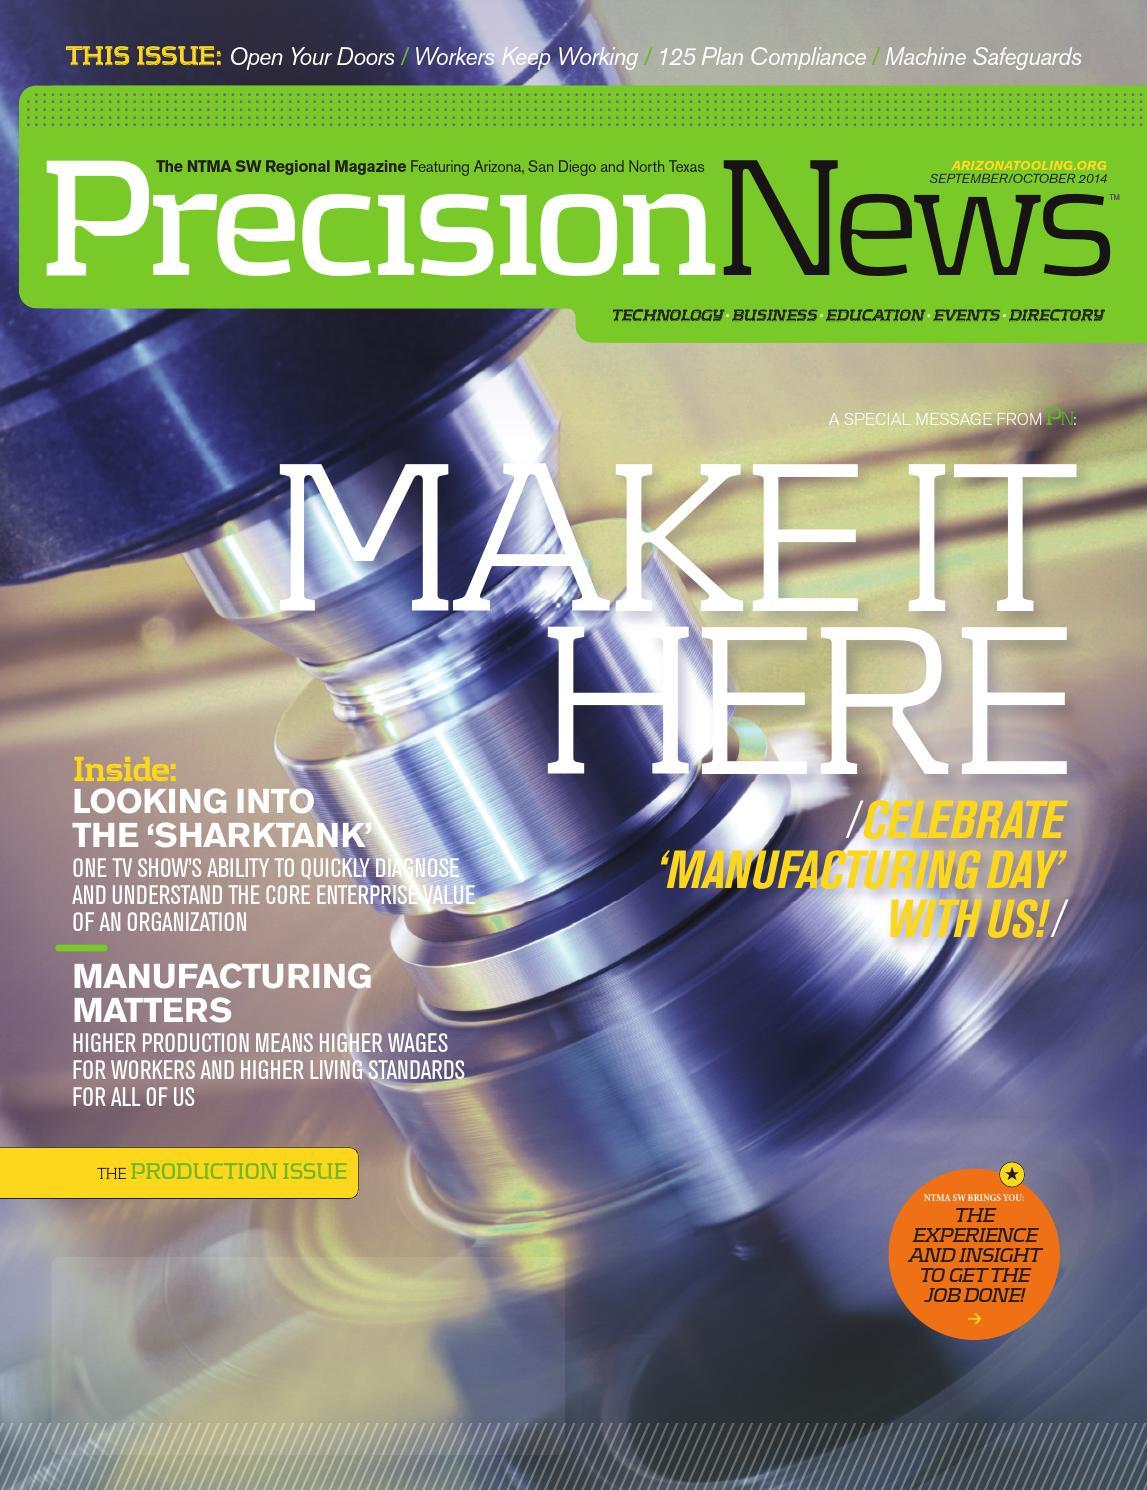 Precision News September/October 2014 by ATMA - Chris